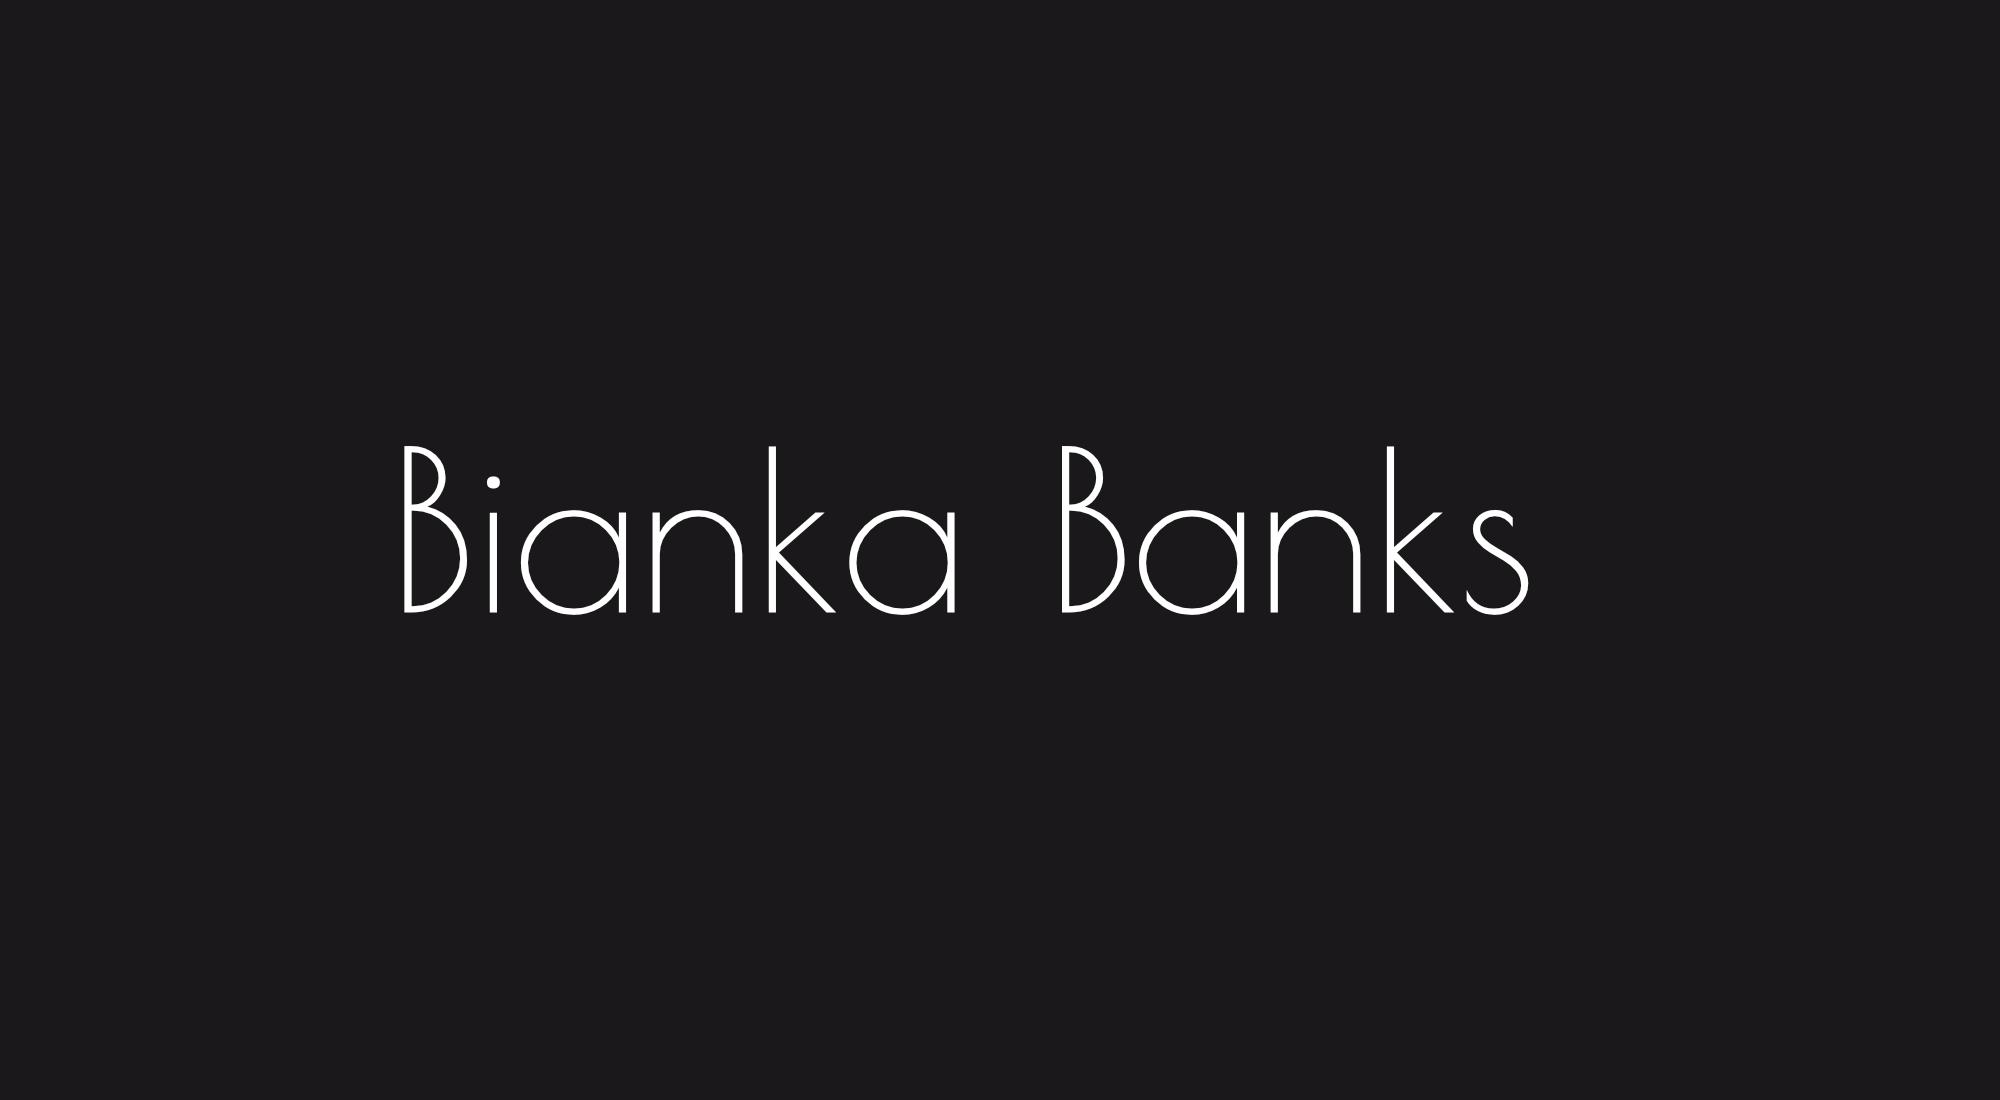 Bianka Banks